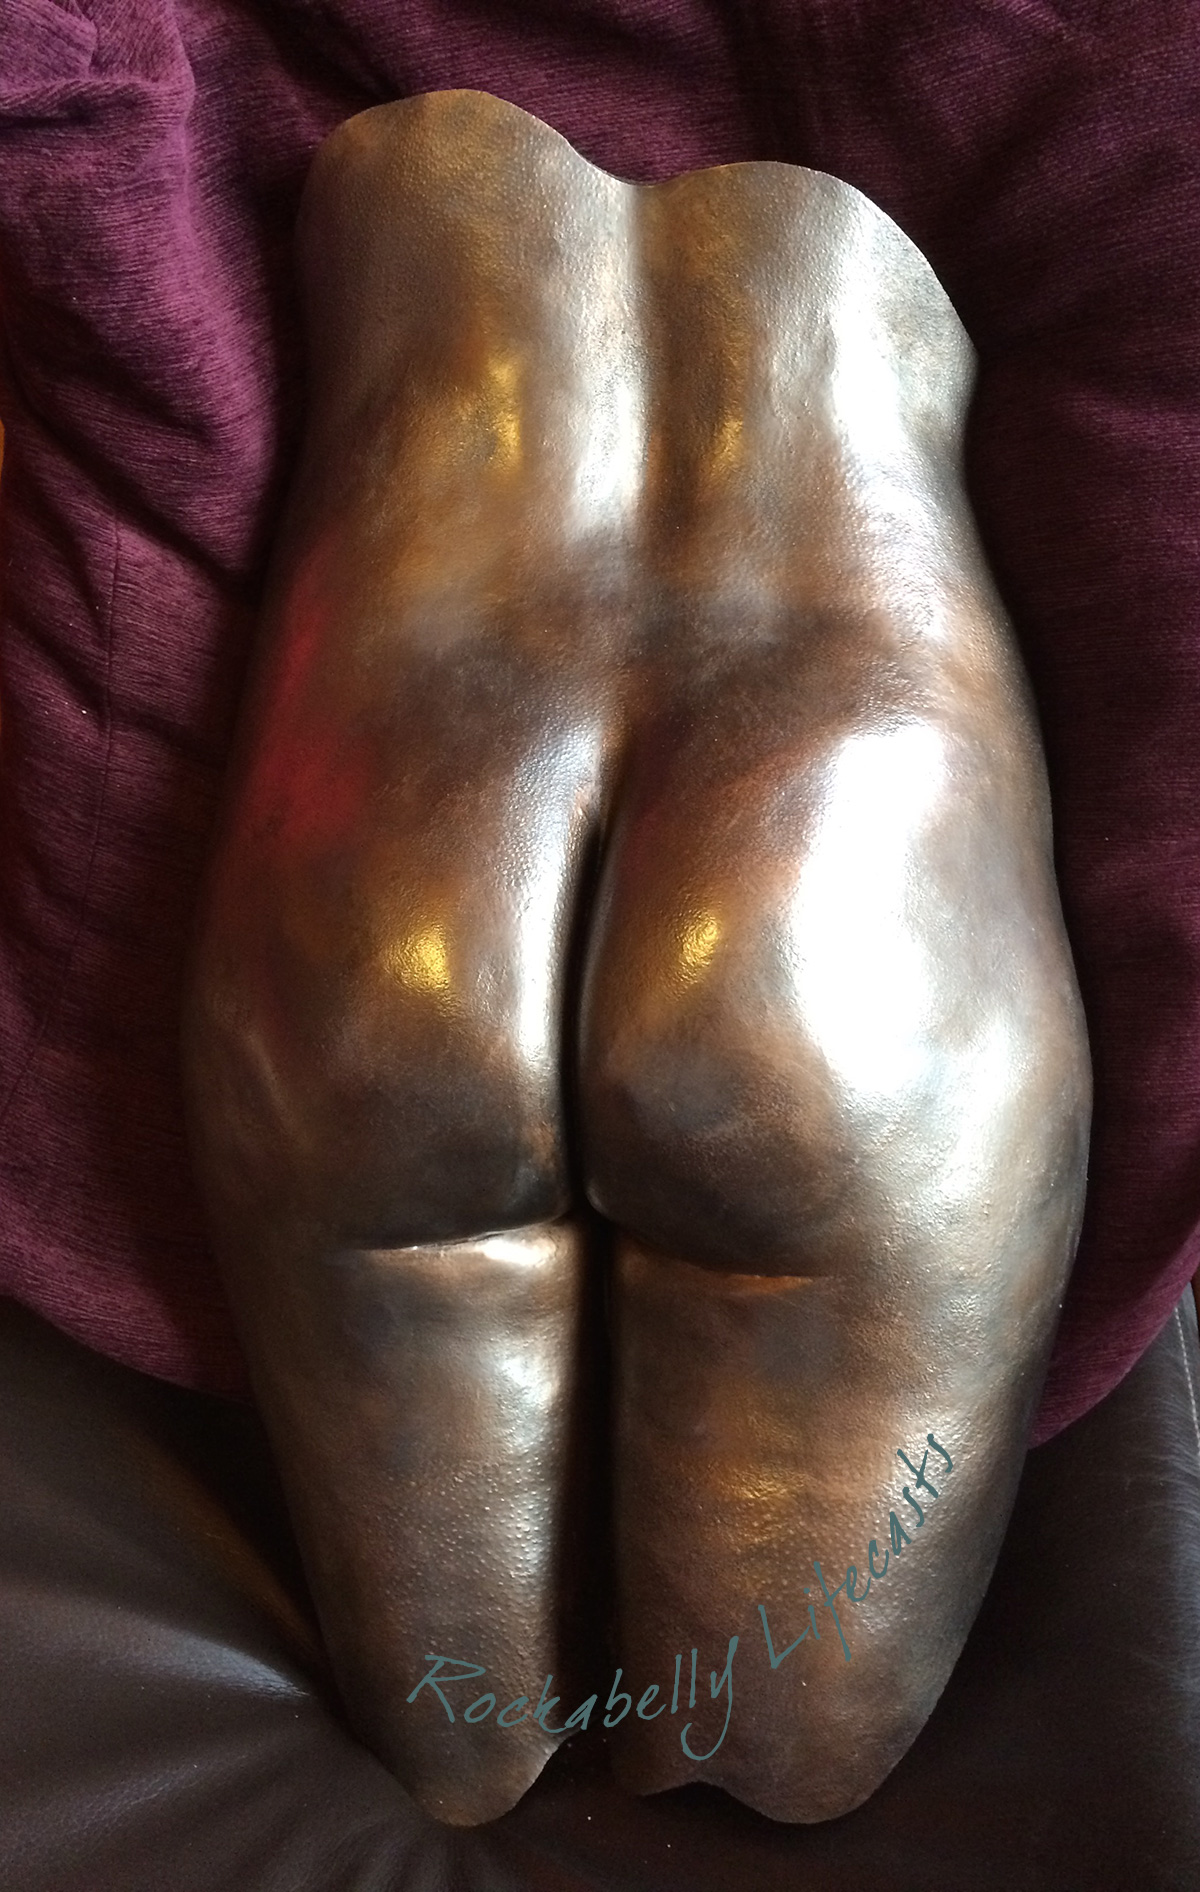 Rockabelly female bronze bottom casting